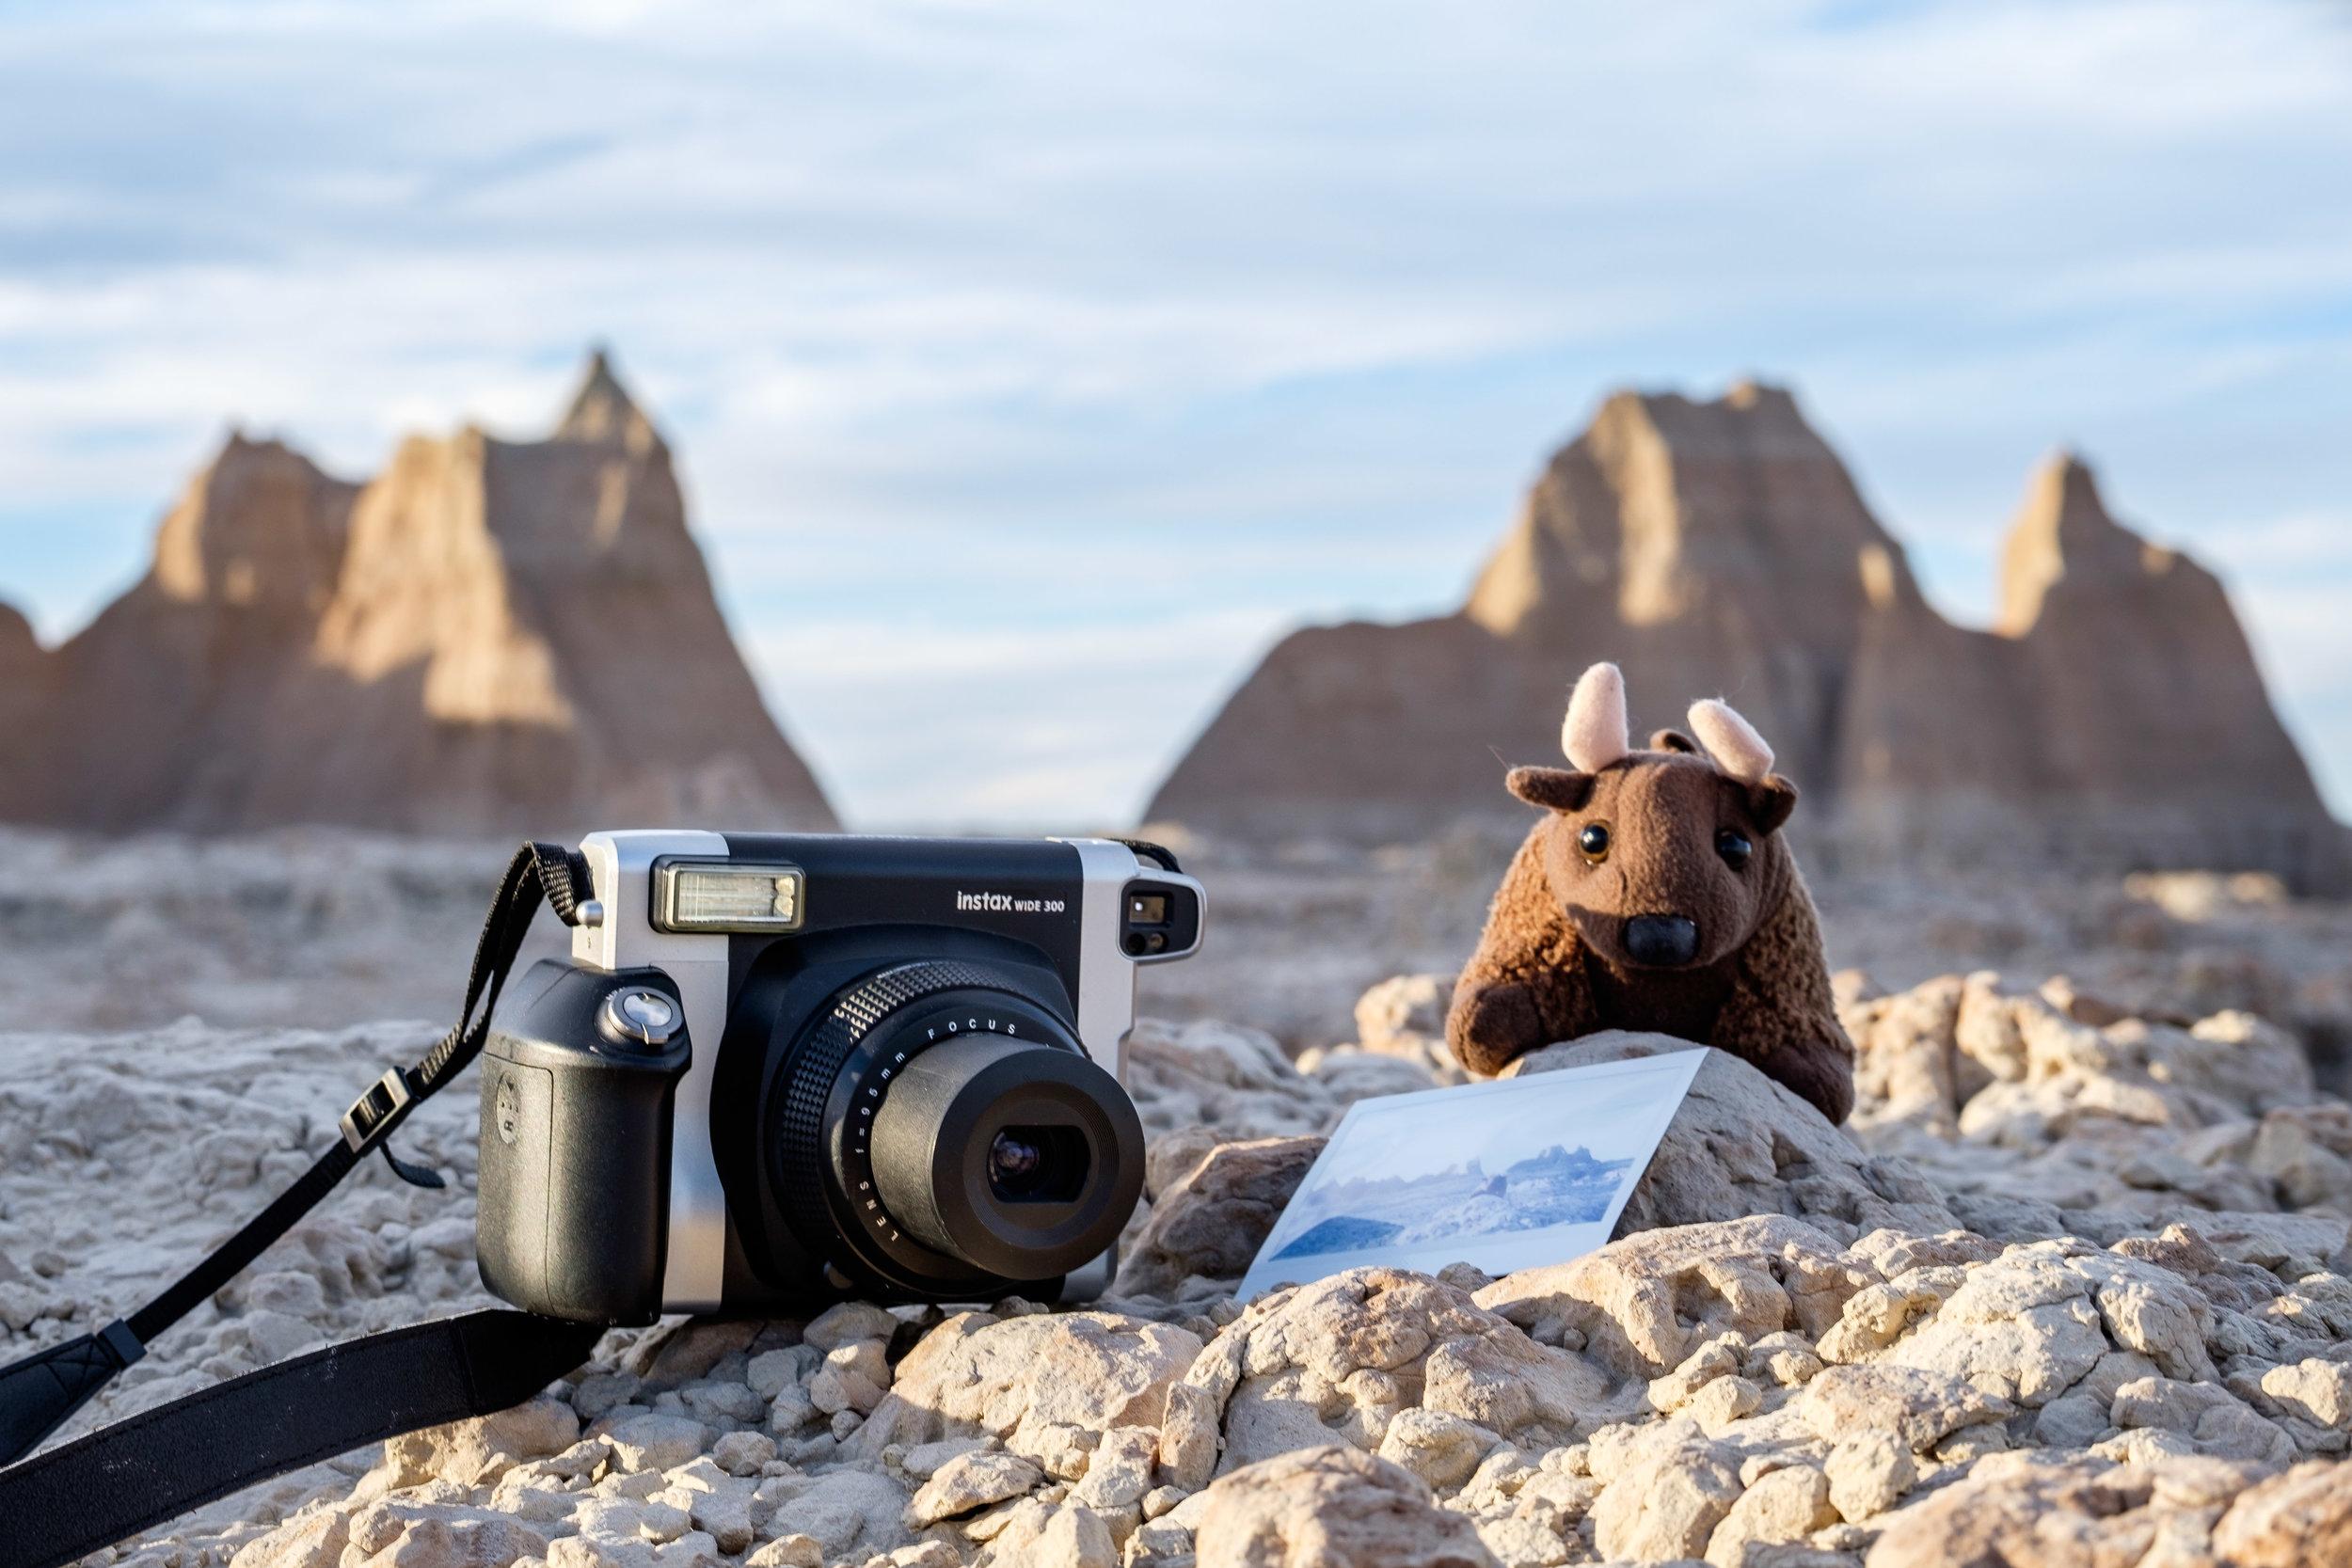 Buddy Bison and Fujifilm Instax in South Dakota!